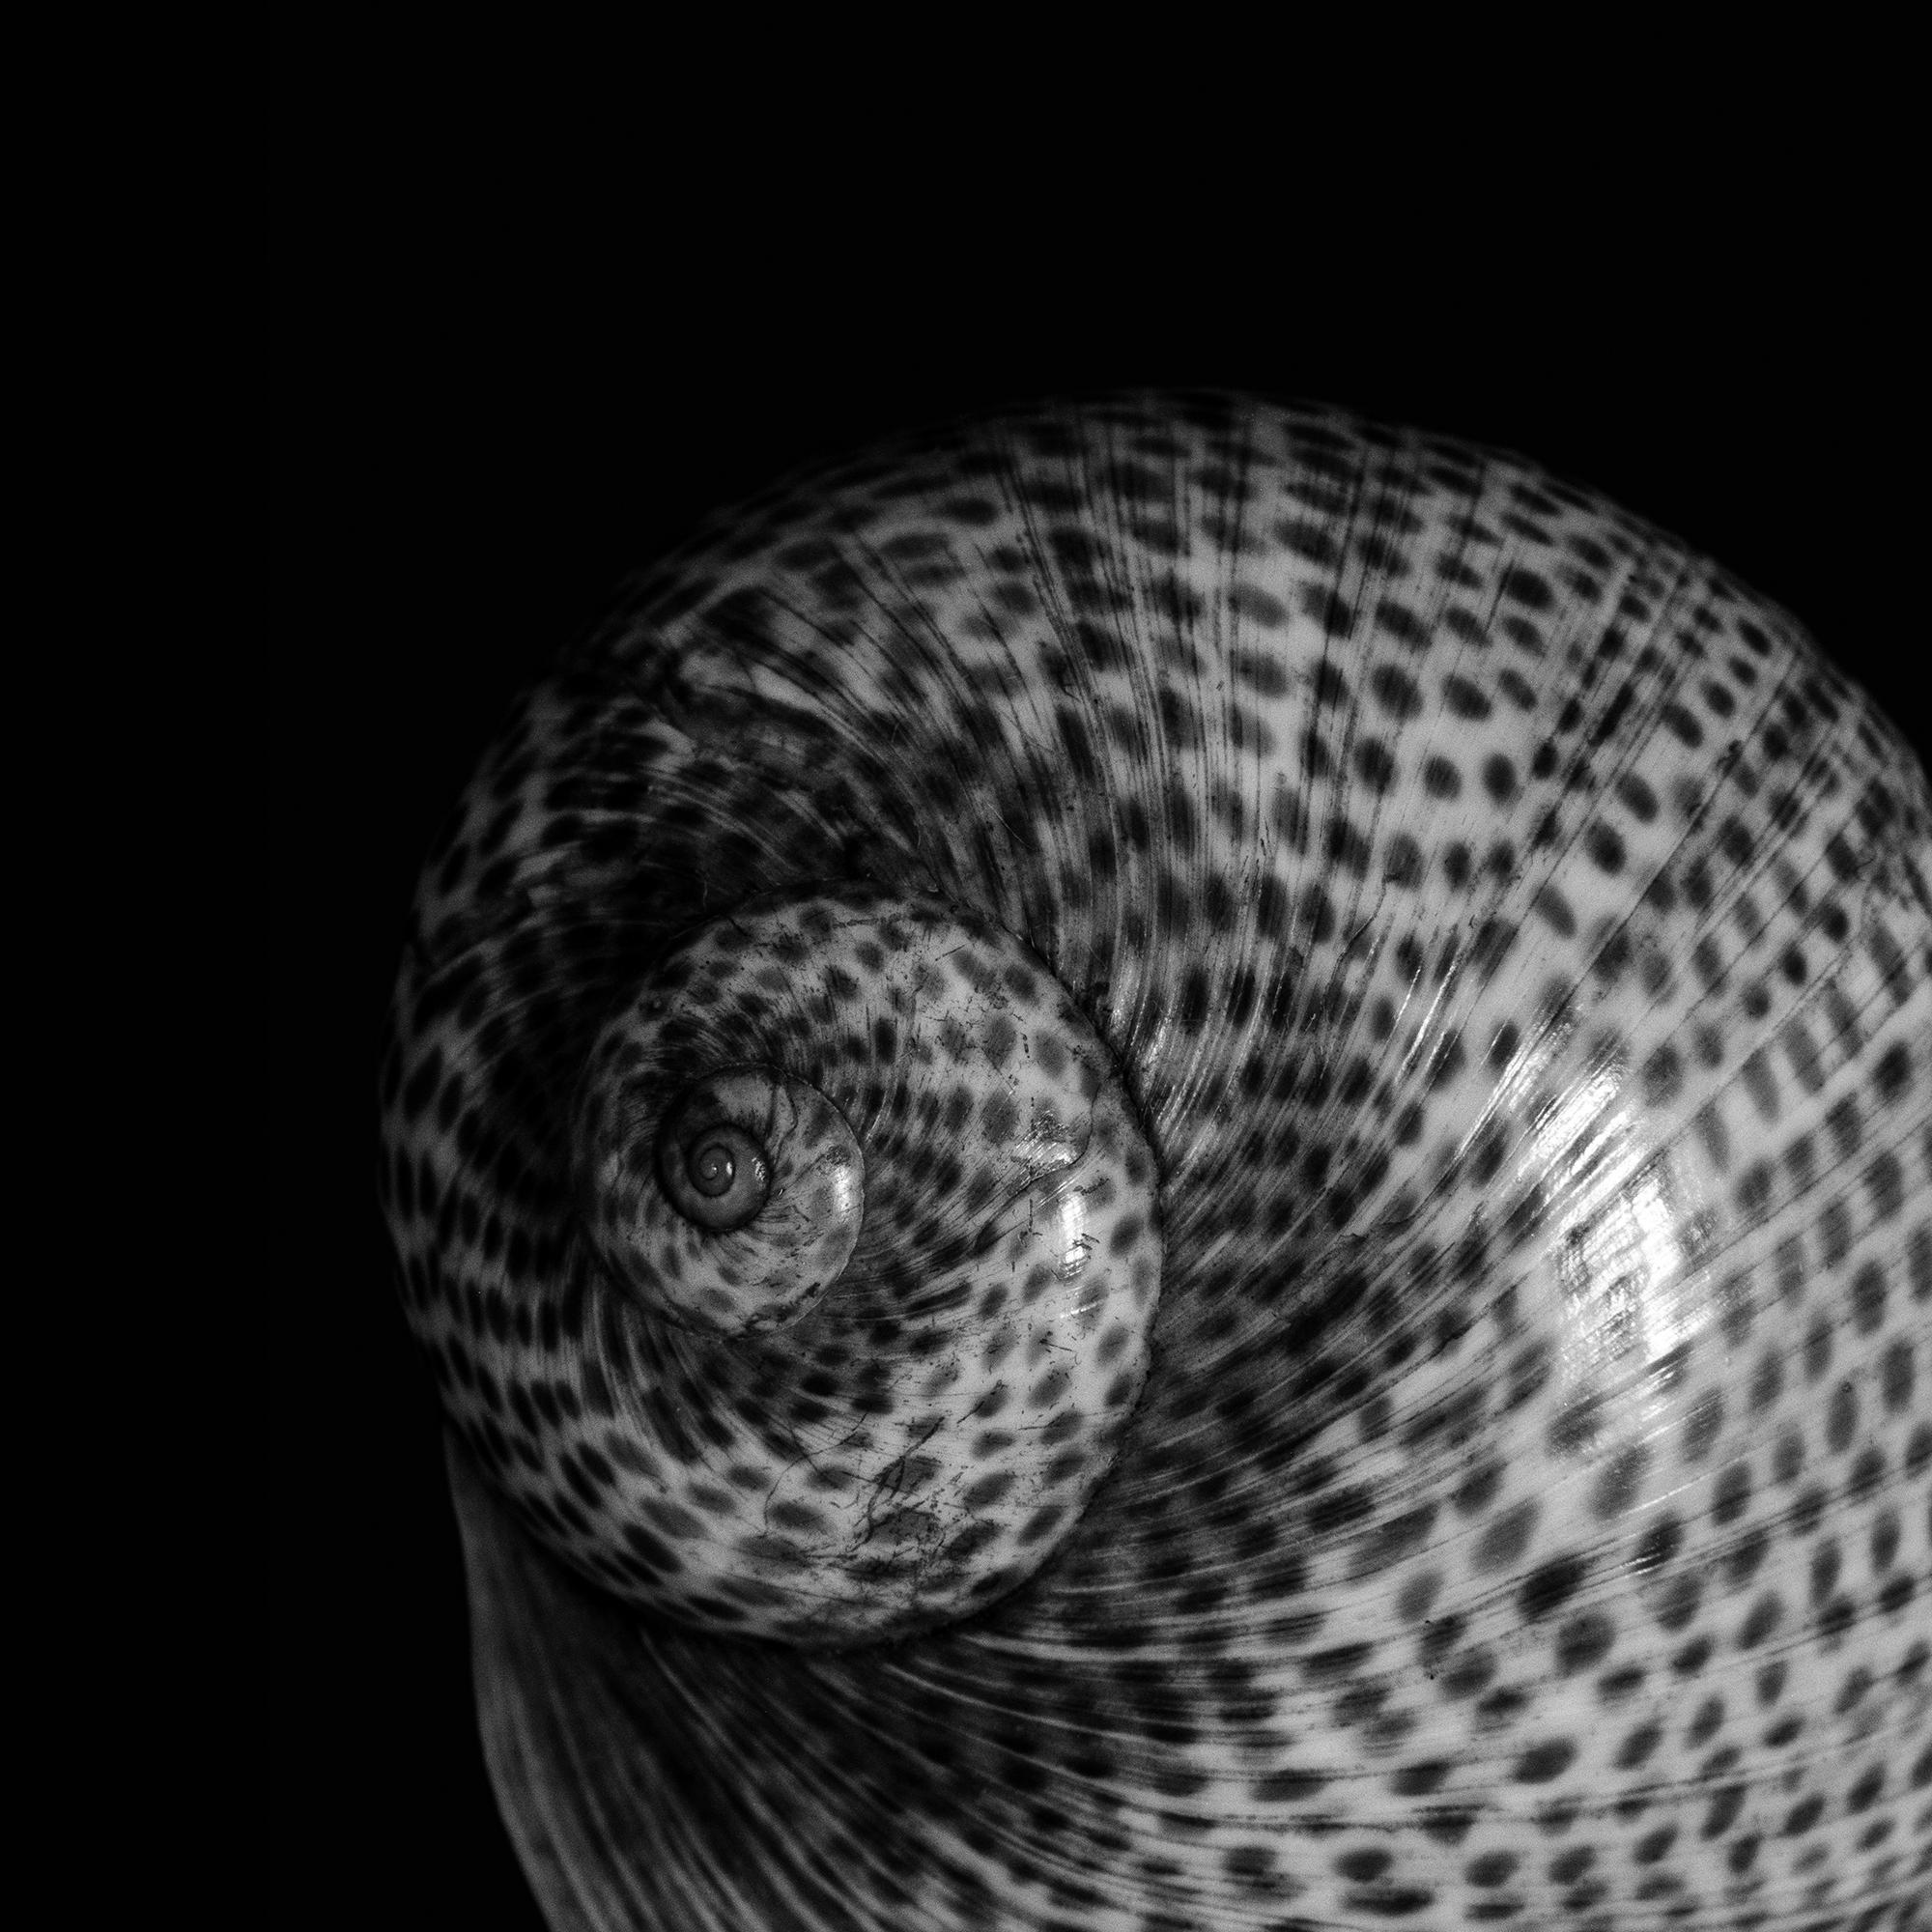 Natica millepunctata, Lamarck